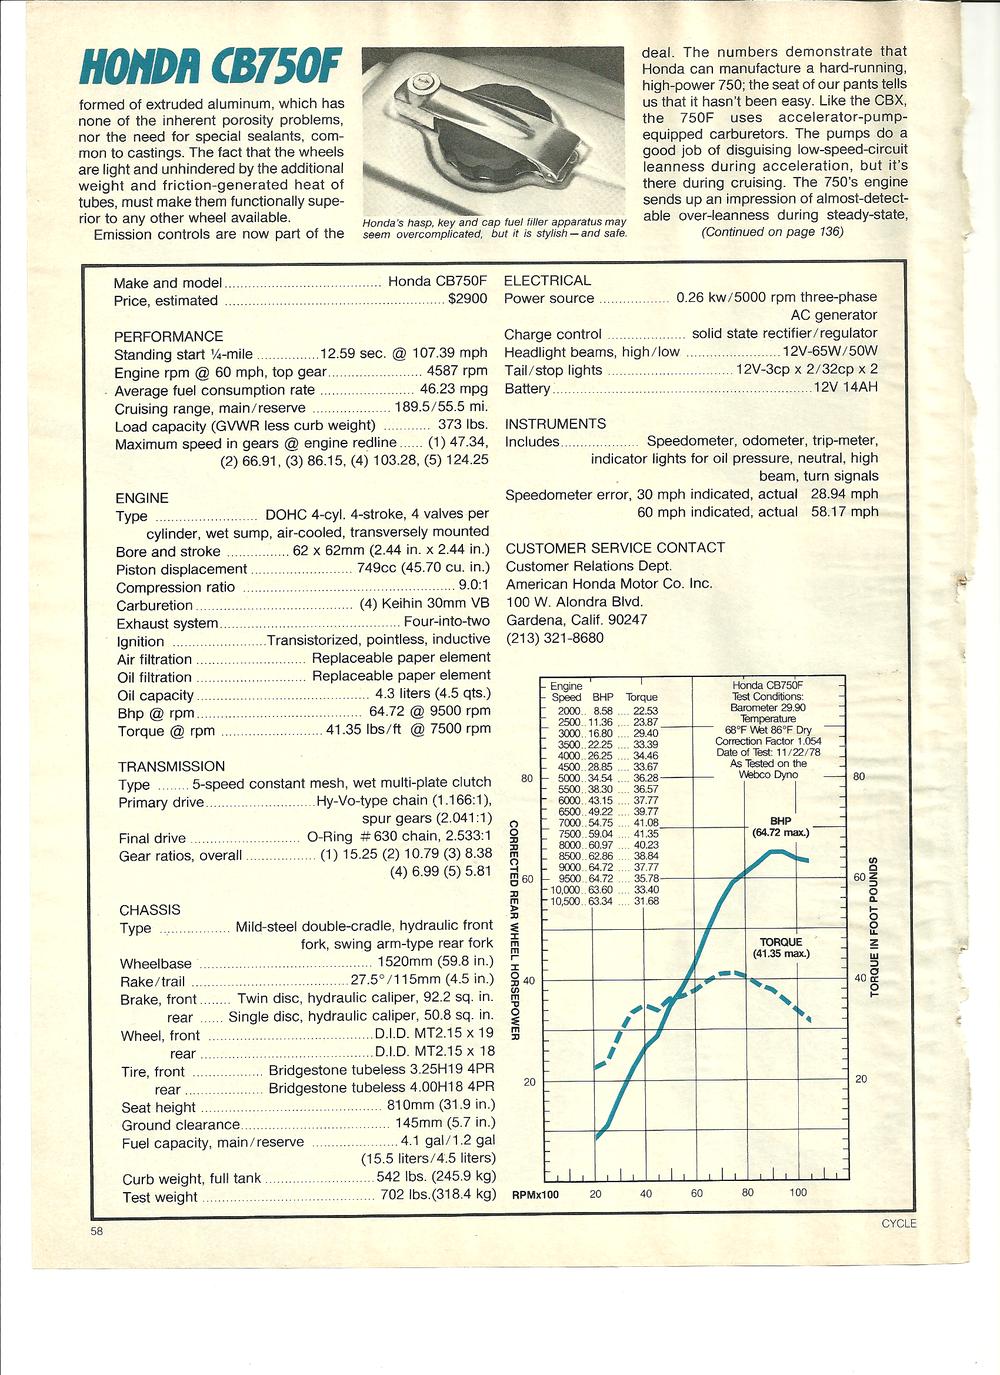 1979_Honda_CB750F_test_pg9.png